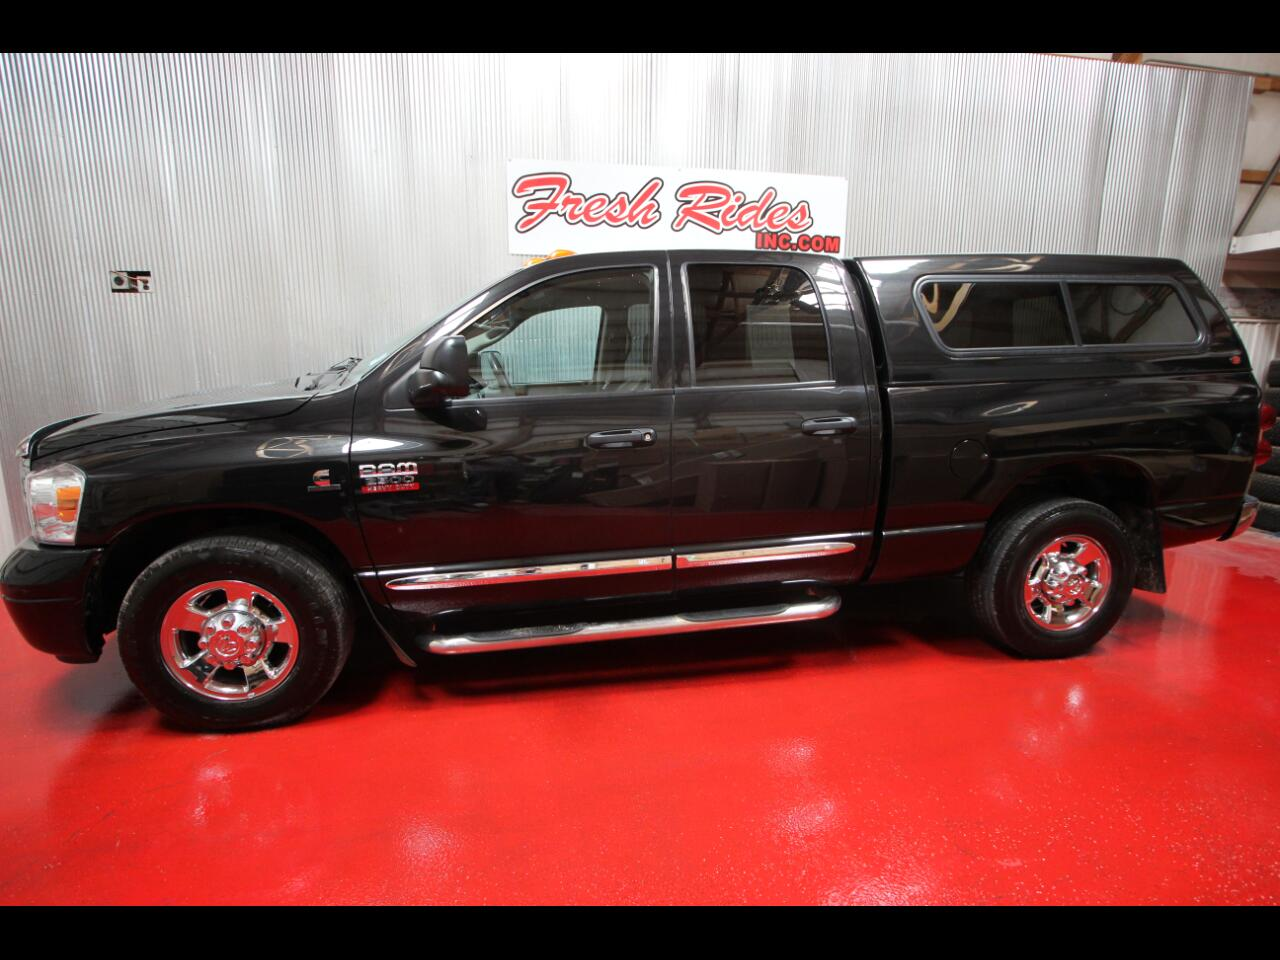 "2007 Dodge Ram 2500 4WD Crew Cab 149"" SLT"